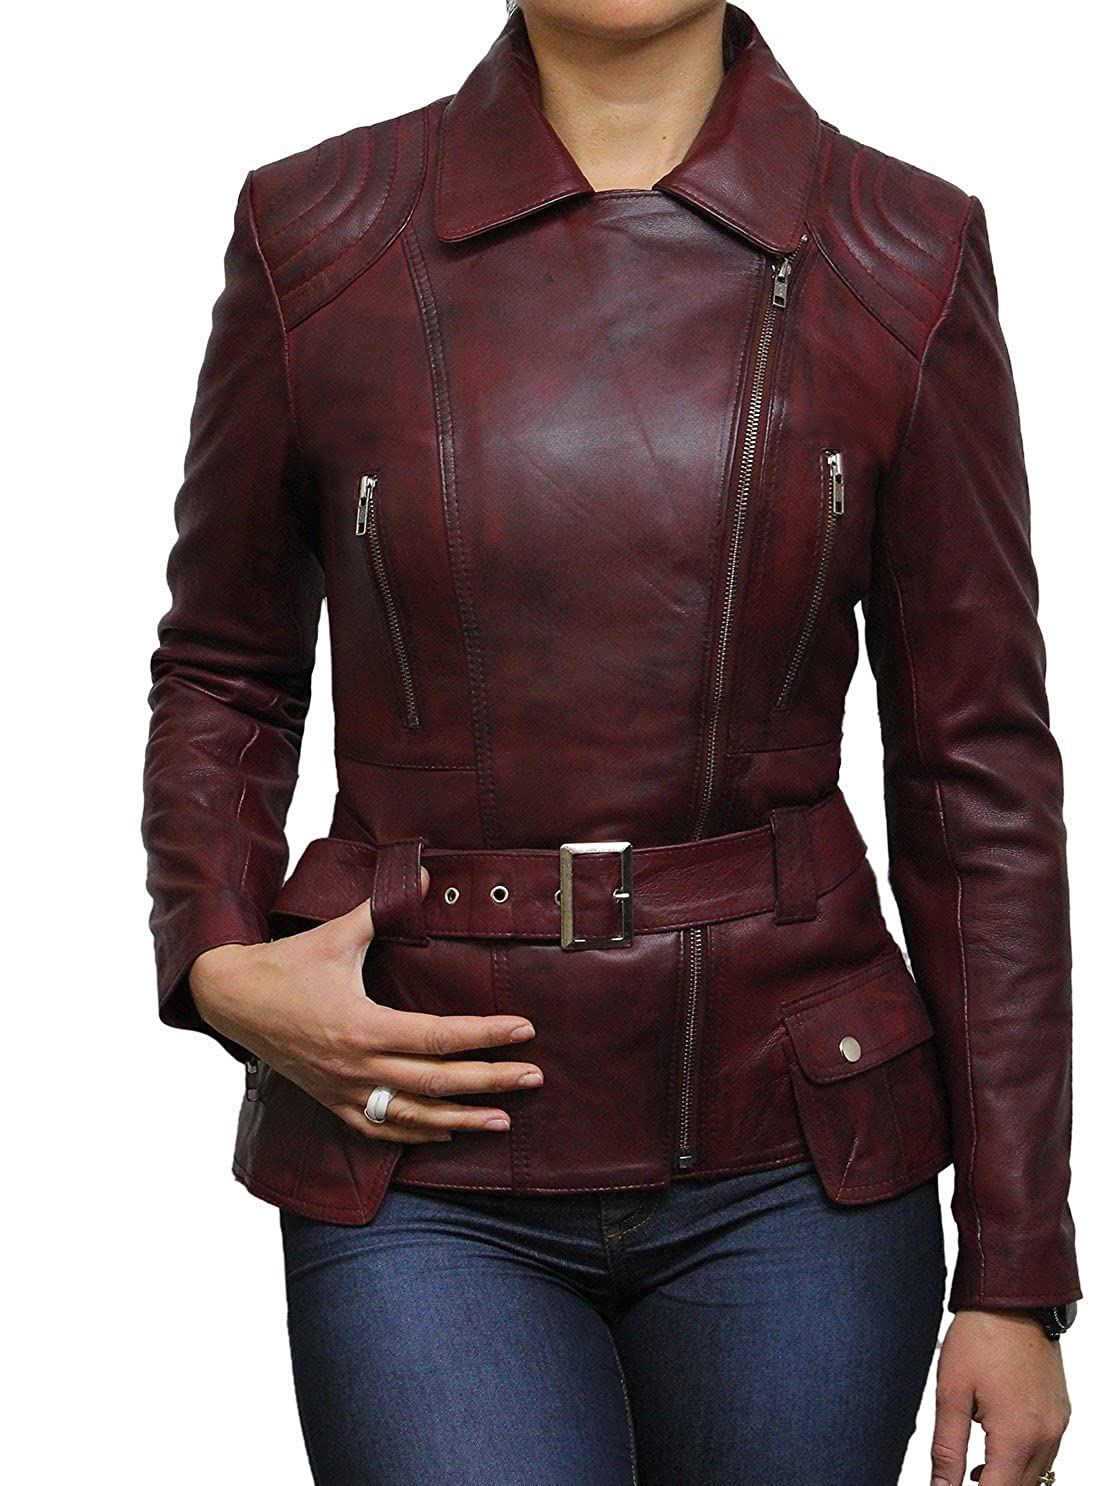 Brandslock Trench Ladies Mid Length Designer Real Leather Jacket Sale